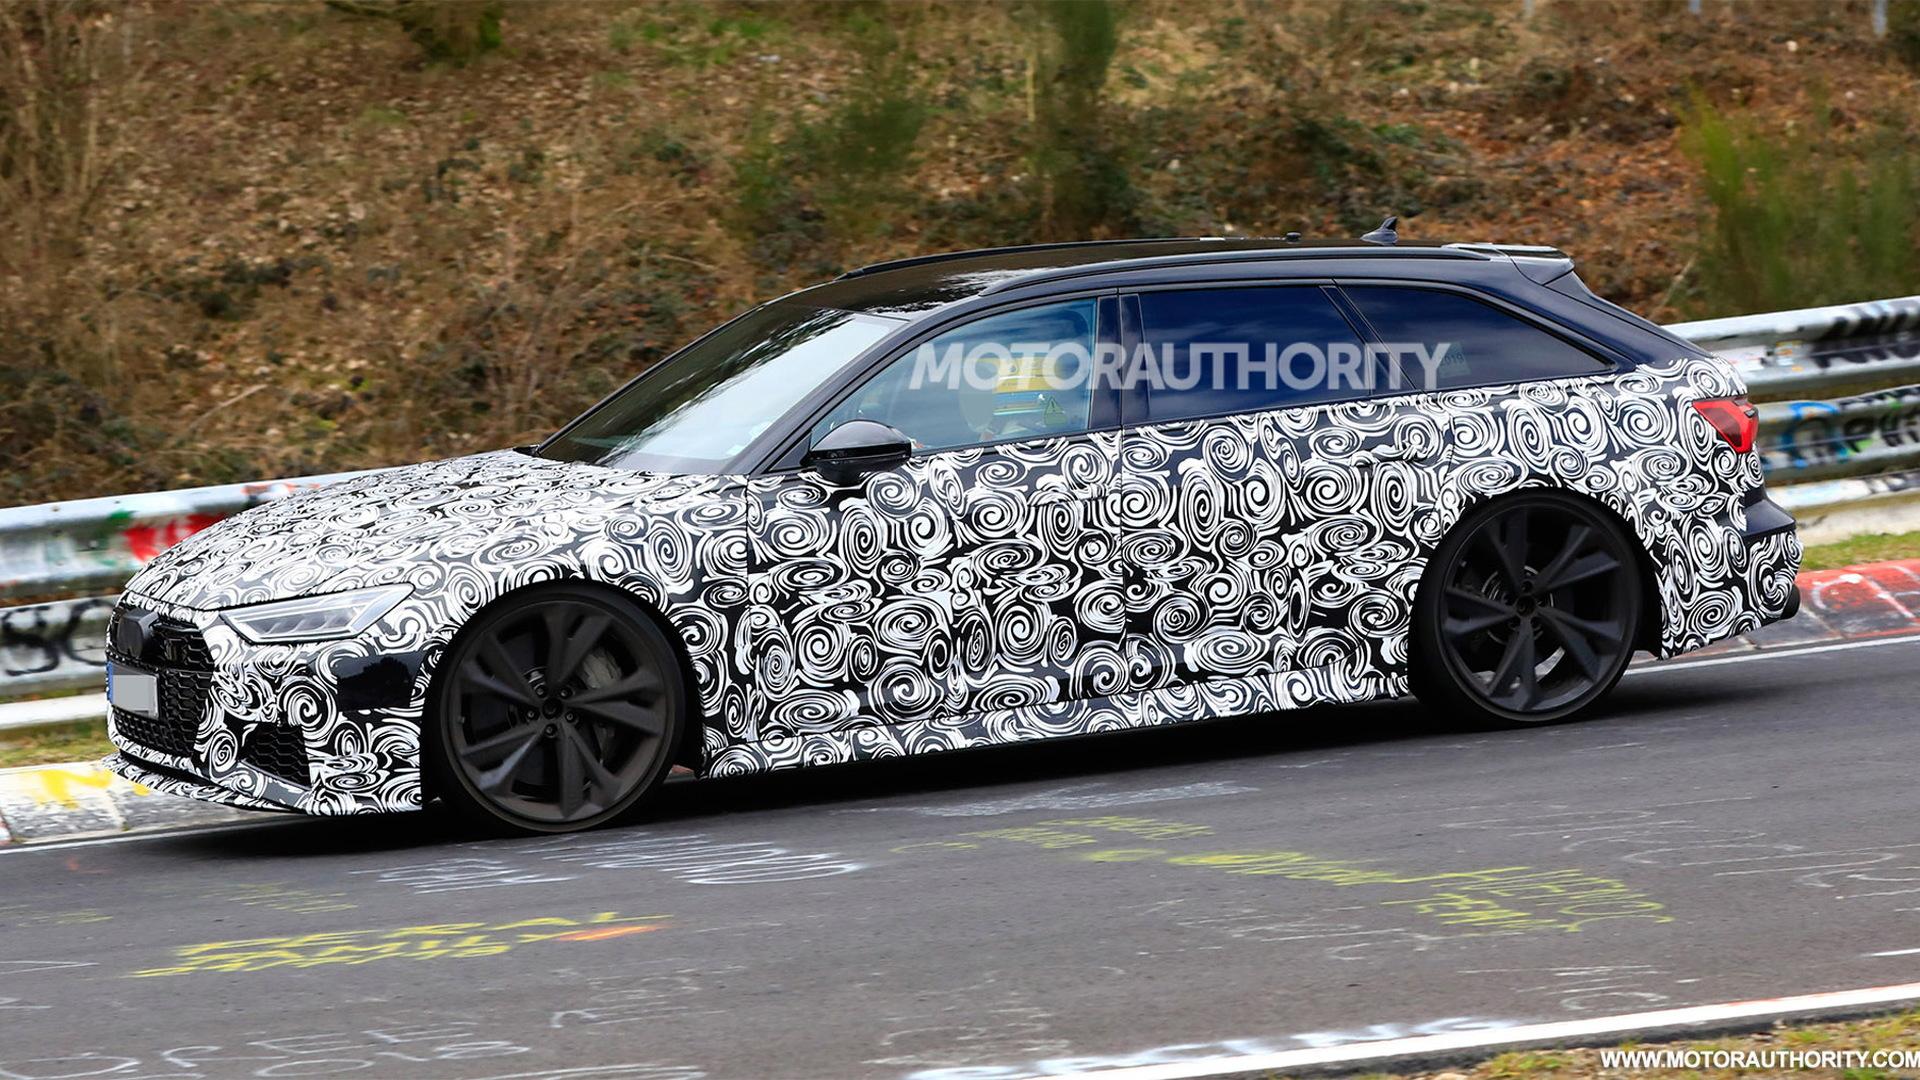 2020 Audi RS 6 Avant spy shots - Image via S. Baldauf/SB-Medien